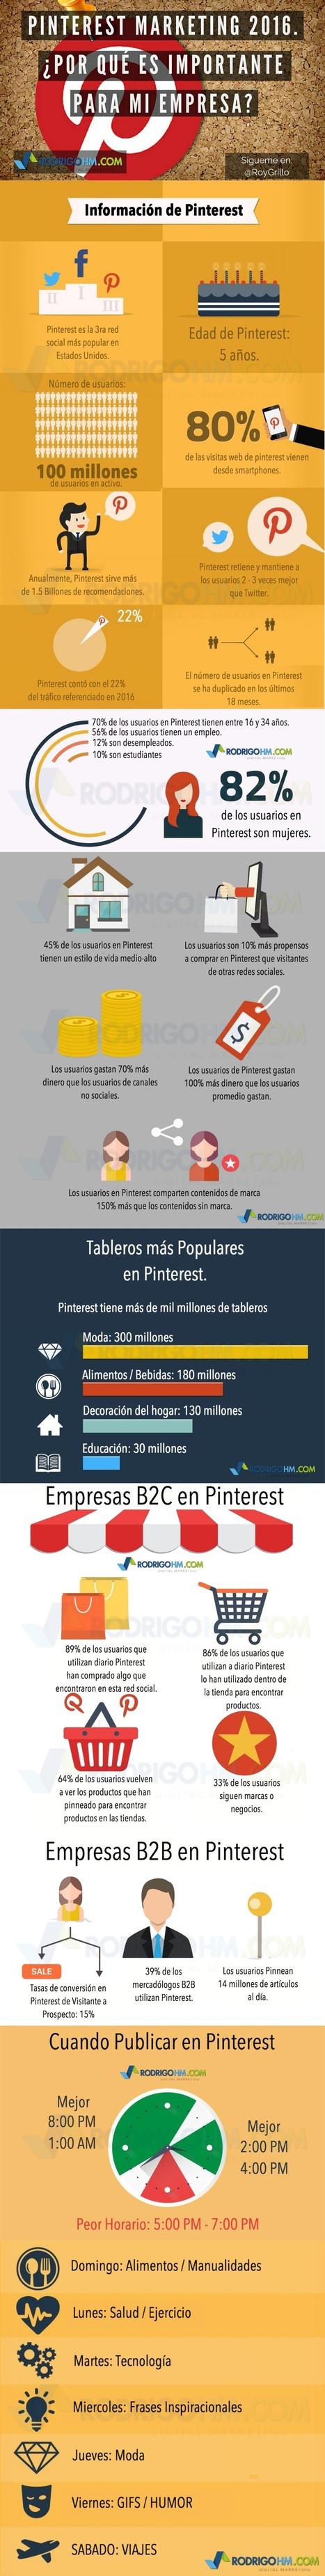 Pinterest: por qué es importante para tu Empresa #infografia #infographic #socialmedia | MediosSociales | Scoop.it